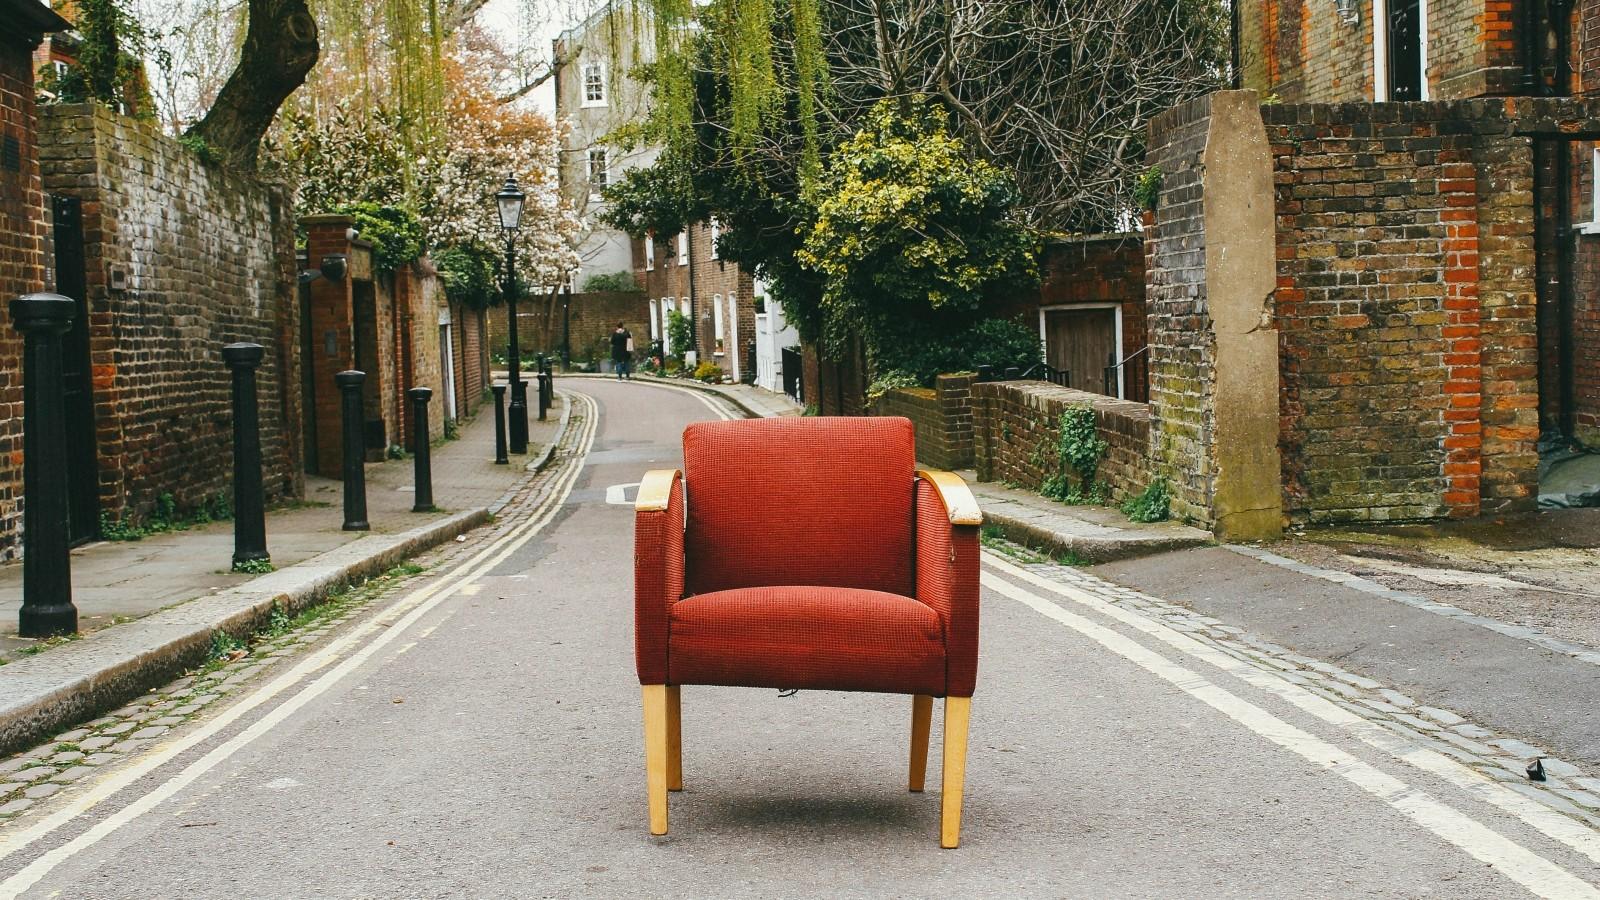 Bad Chair Day: Nerland v. Toronto-Dominion Bank